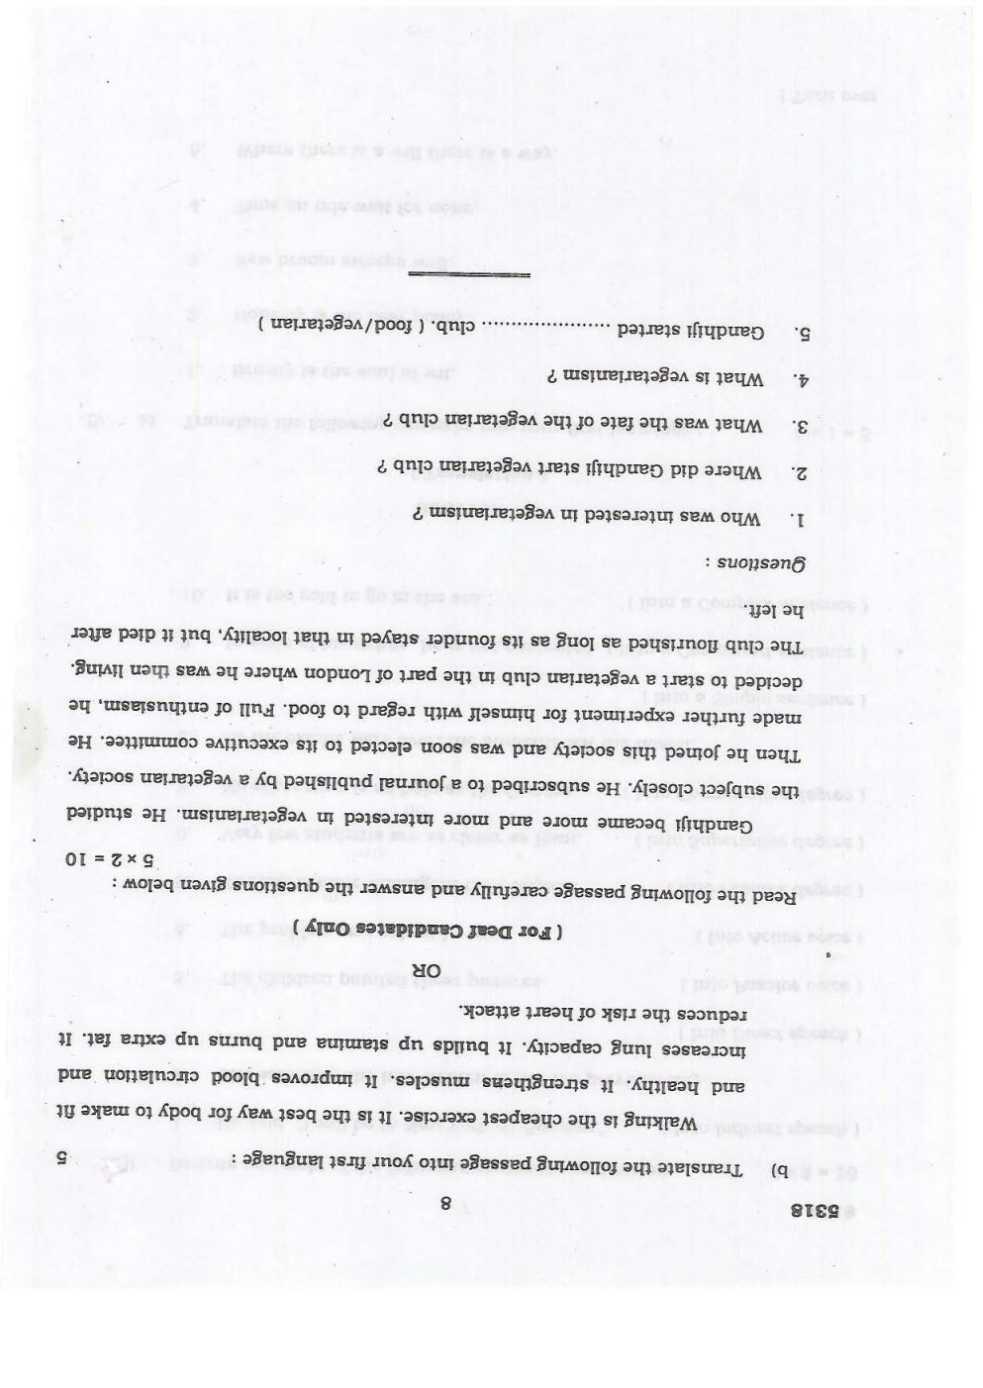 Research paper writing service india tamil nadu